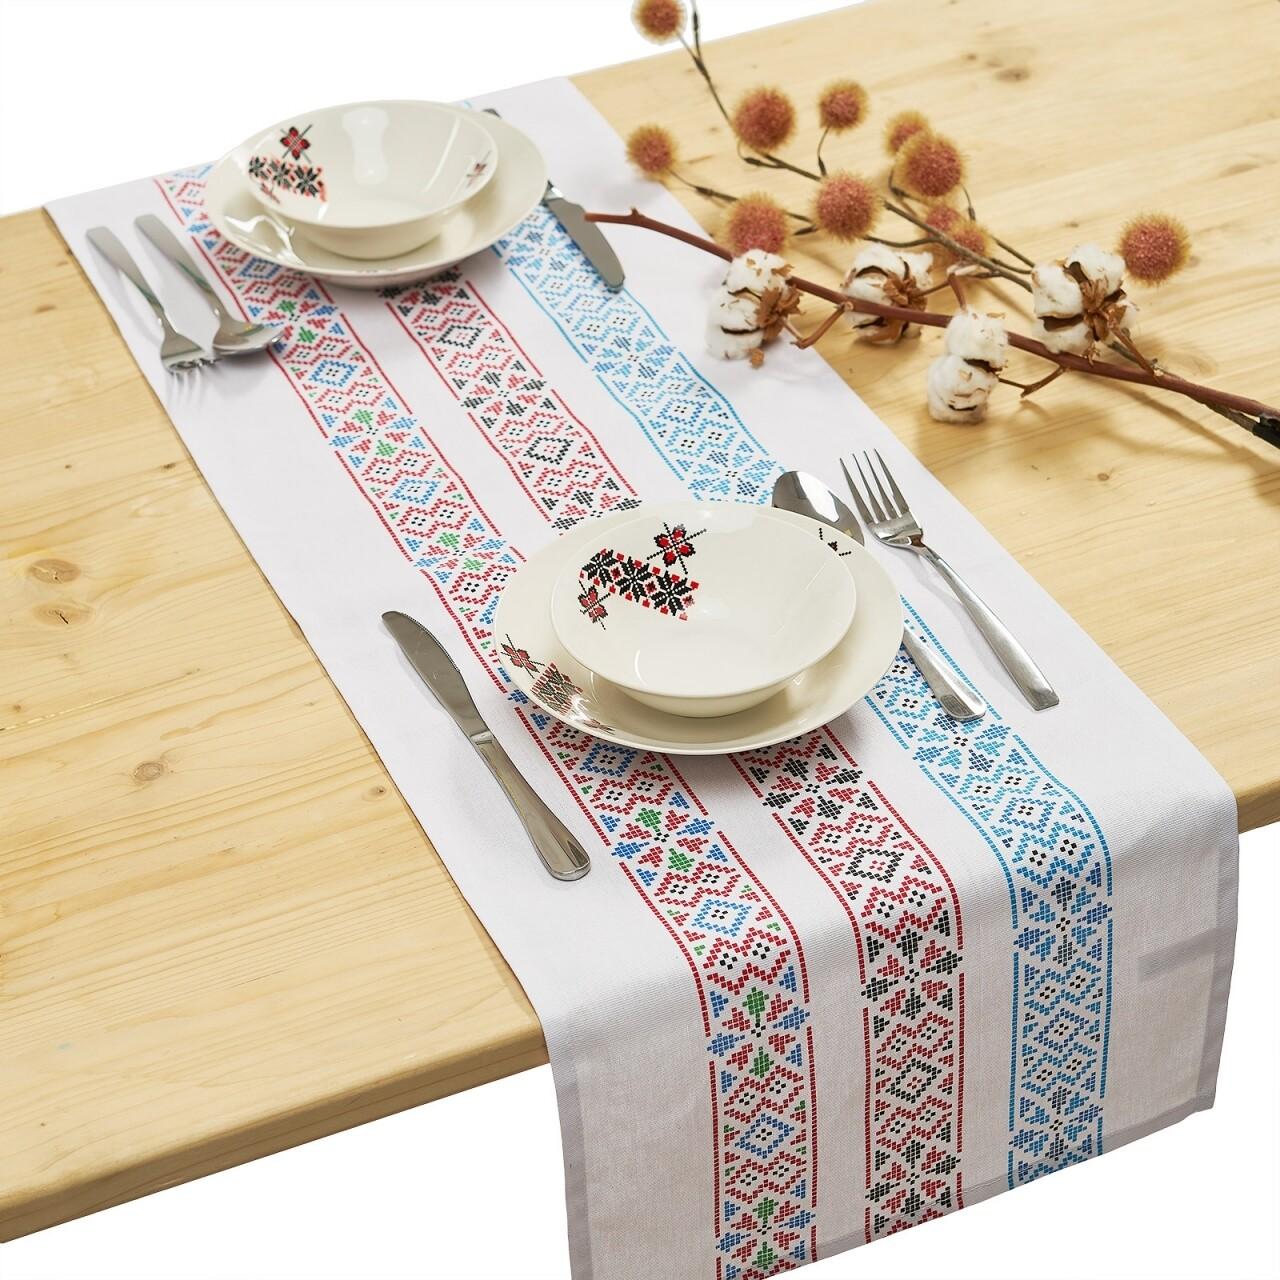 Traversa pentru masa Traditional, Heinner Home, 33 x 120 cm, 100% bumbac, 100% bumbac, alb/albastru/rosu